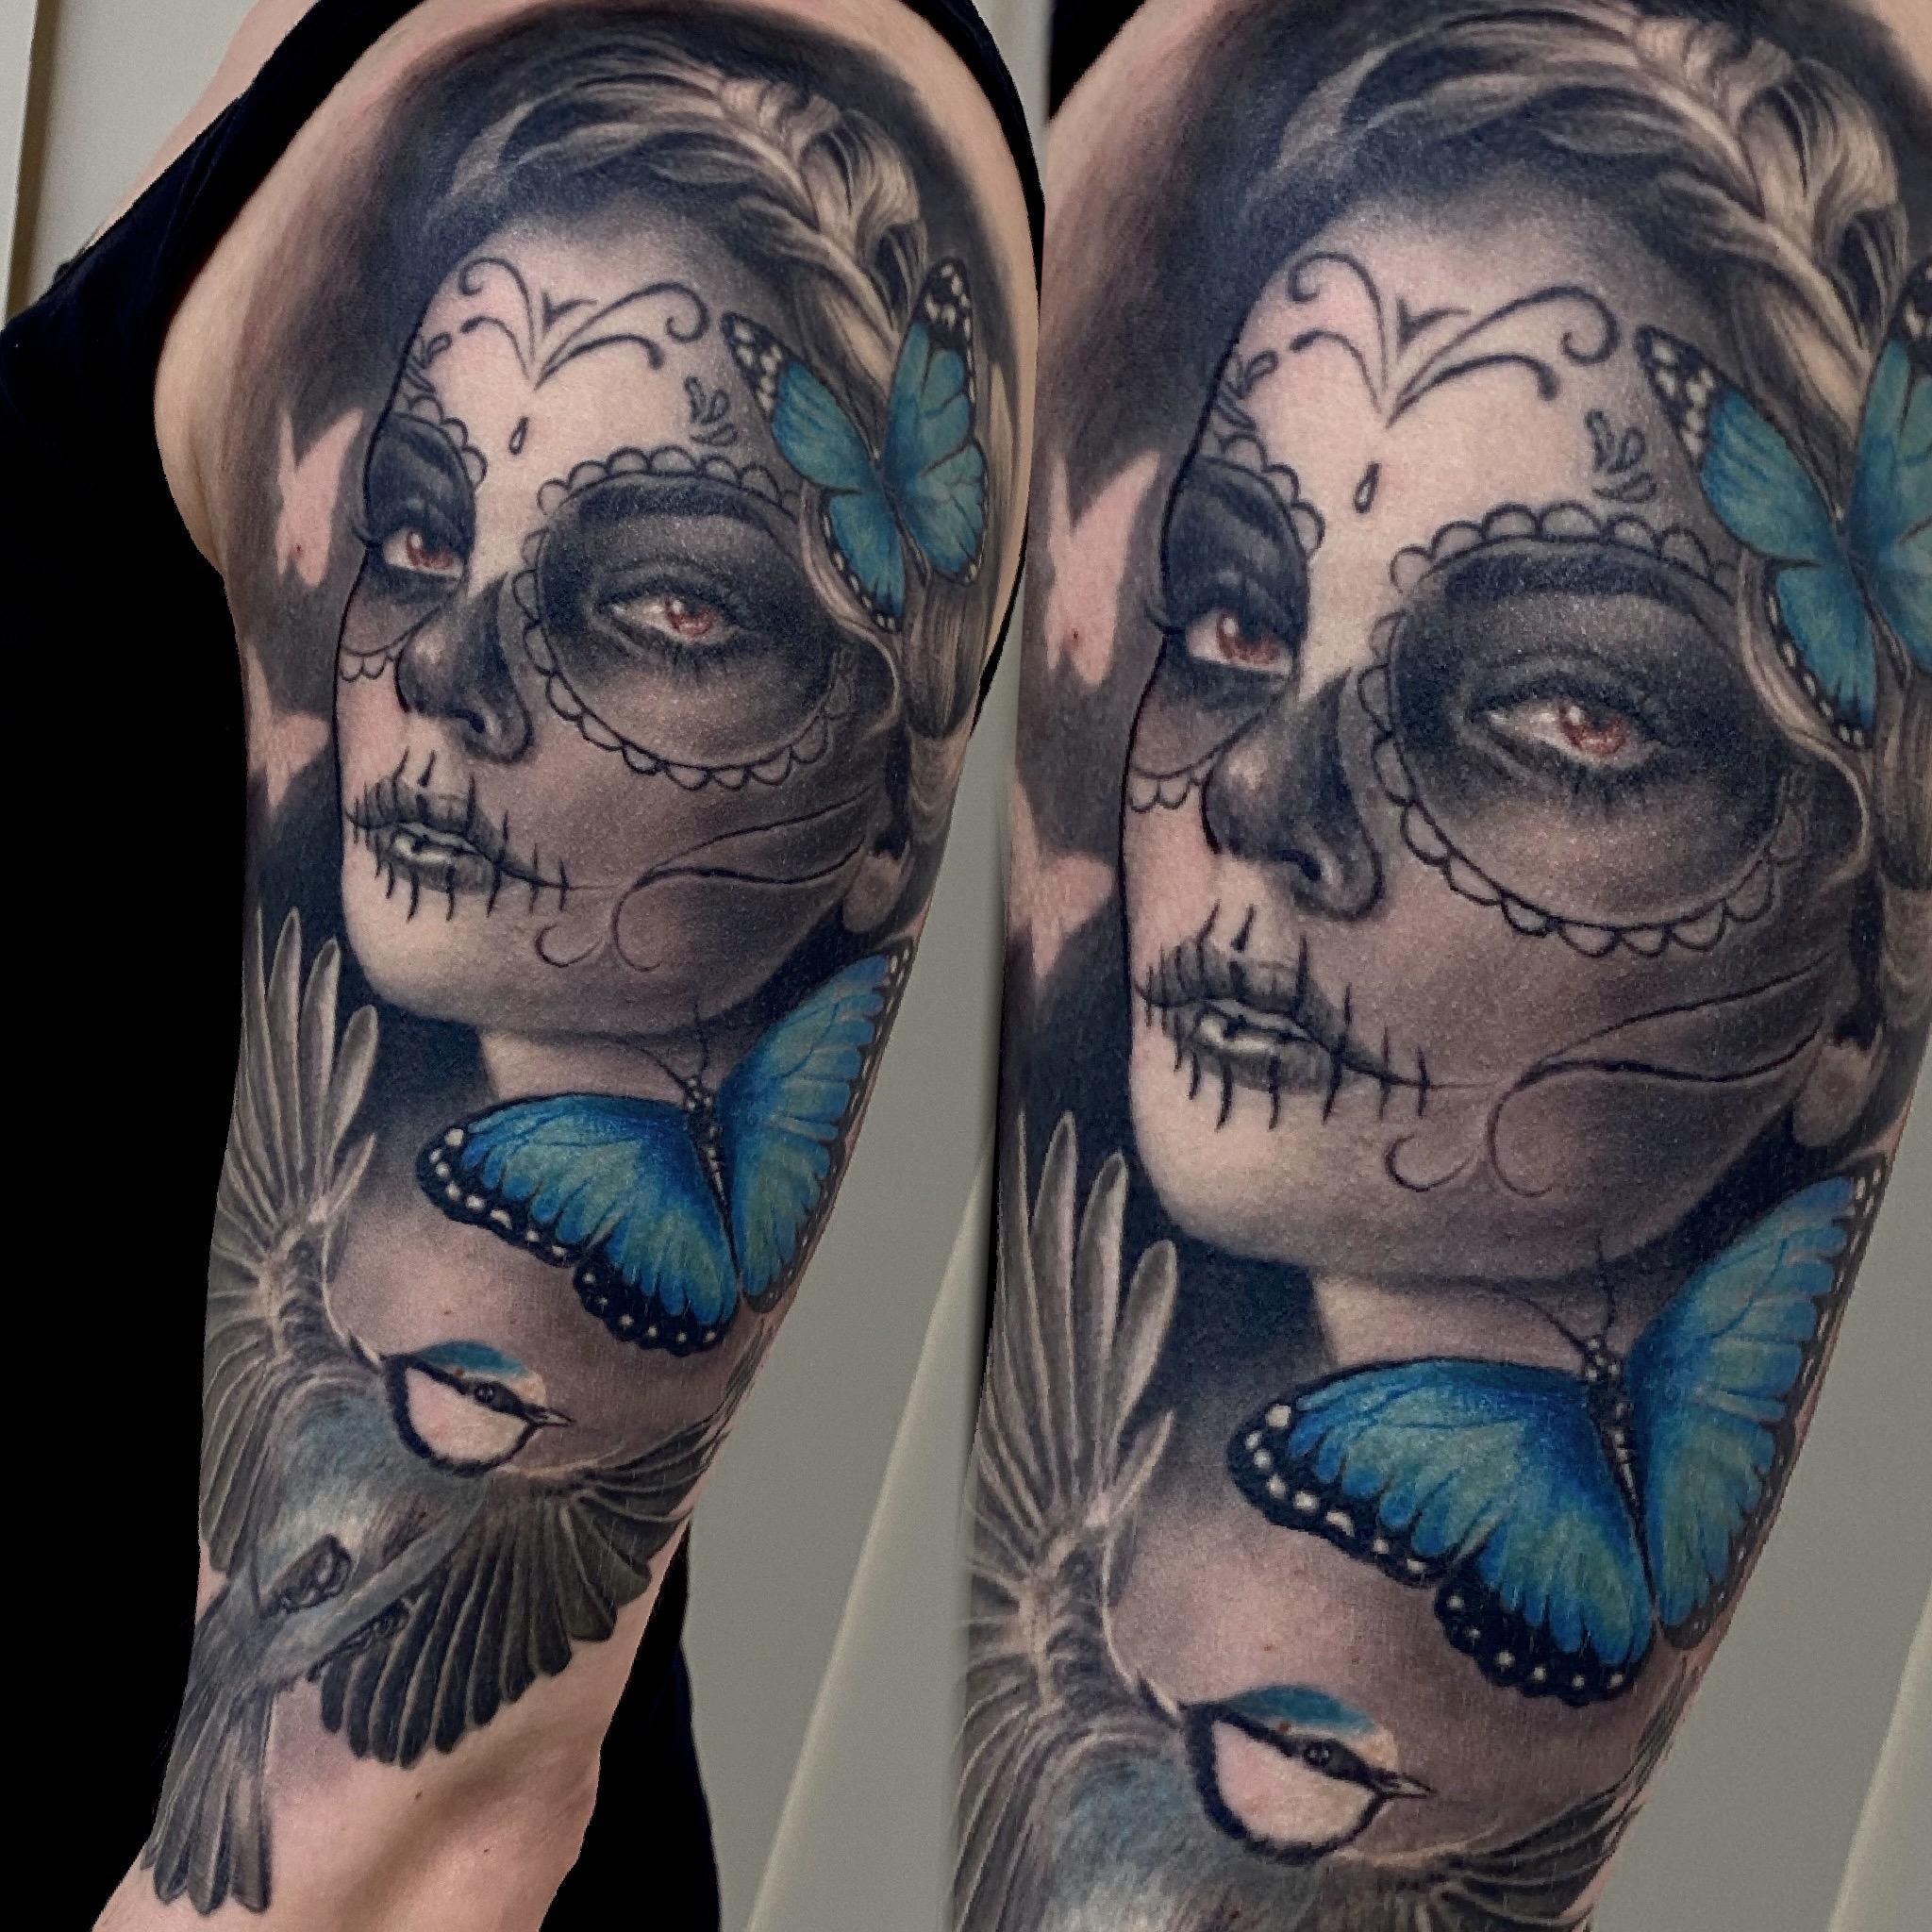 Steffi Eff Tattoo